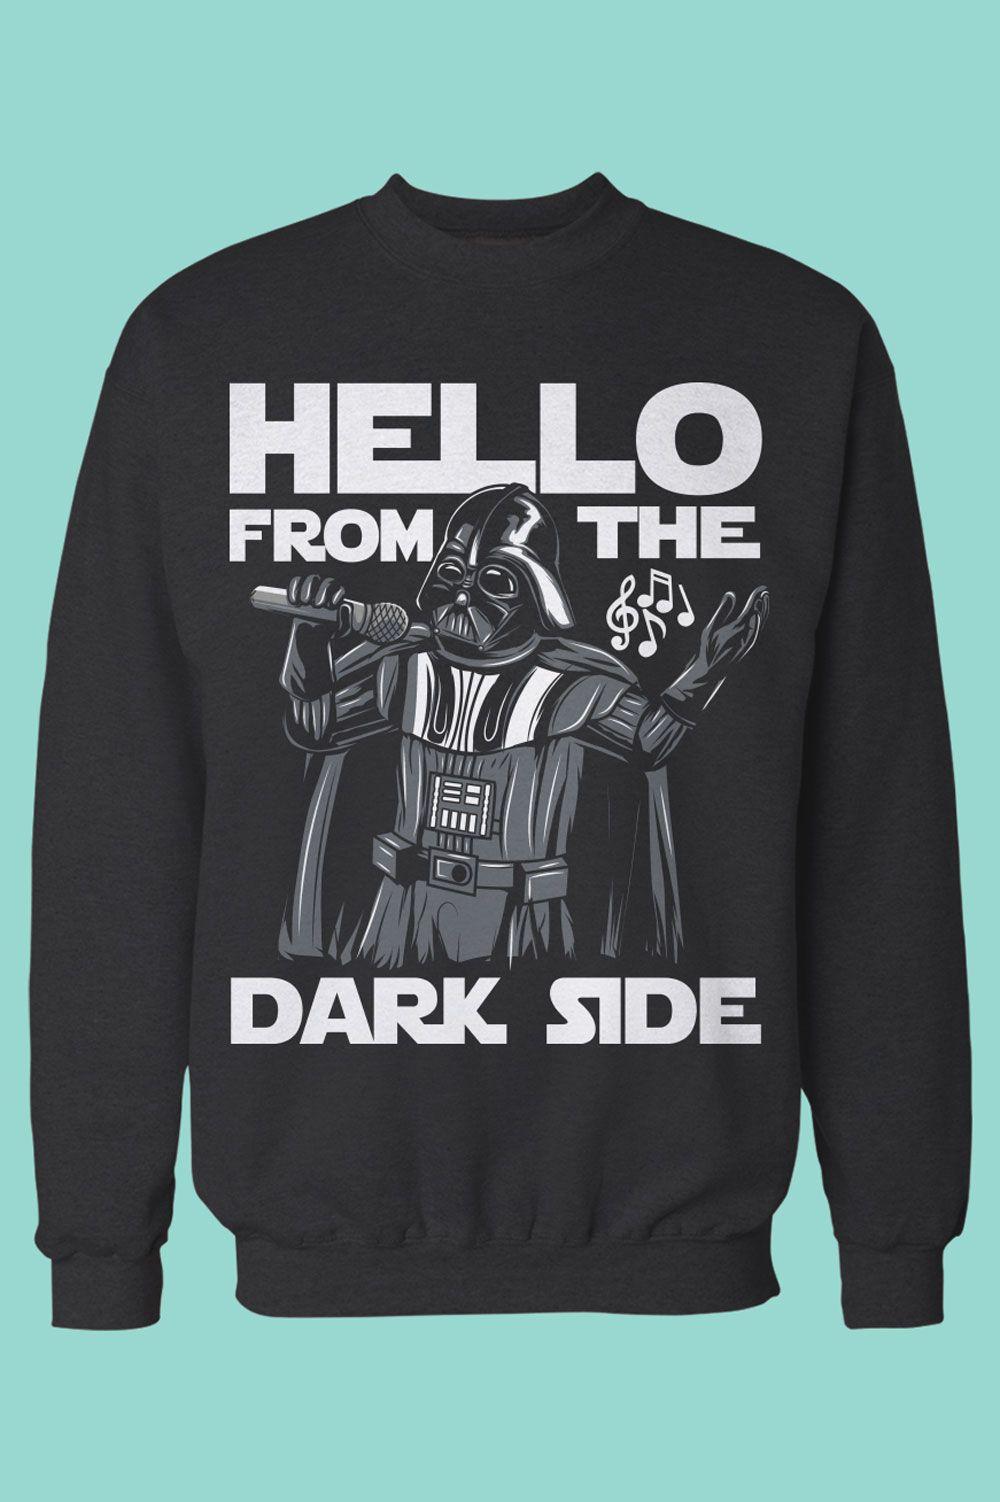 Hahaha Star Wars Nerd Star Wars Geek Star Wars Love